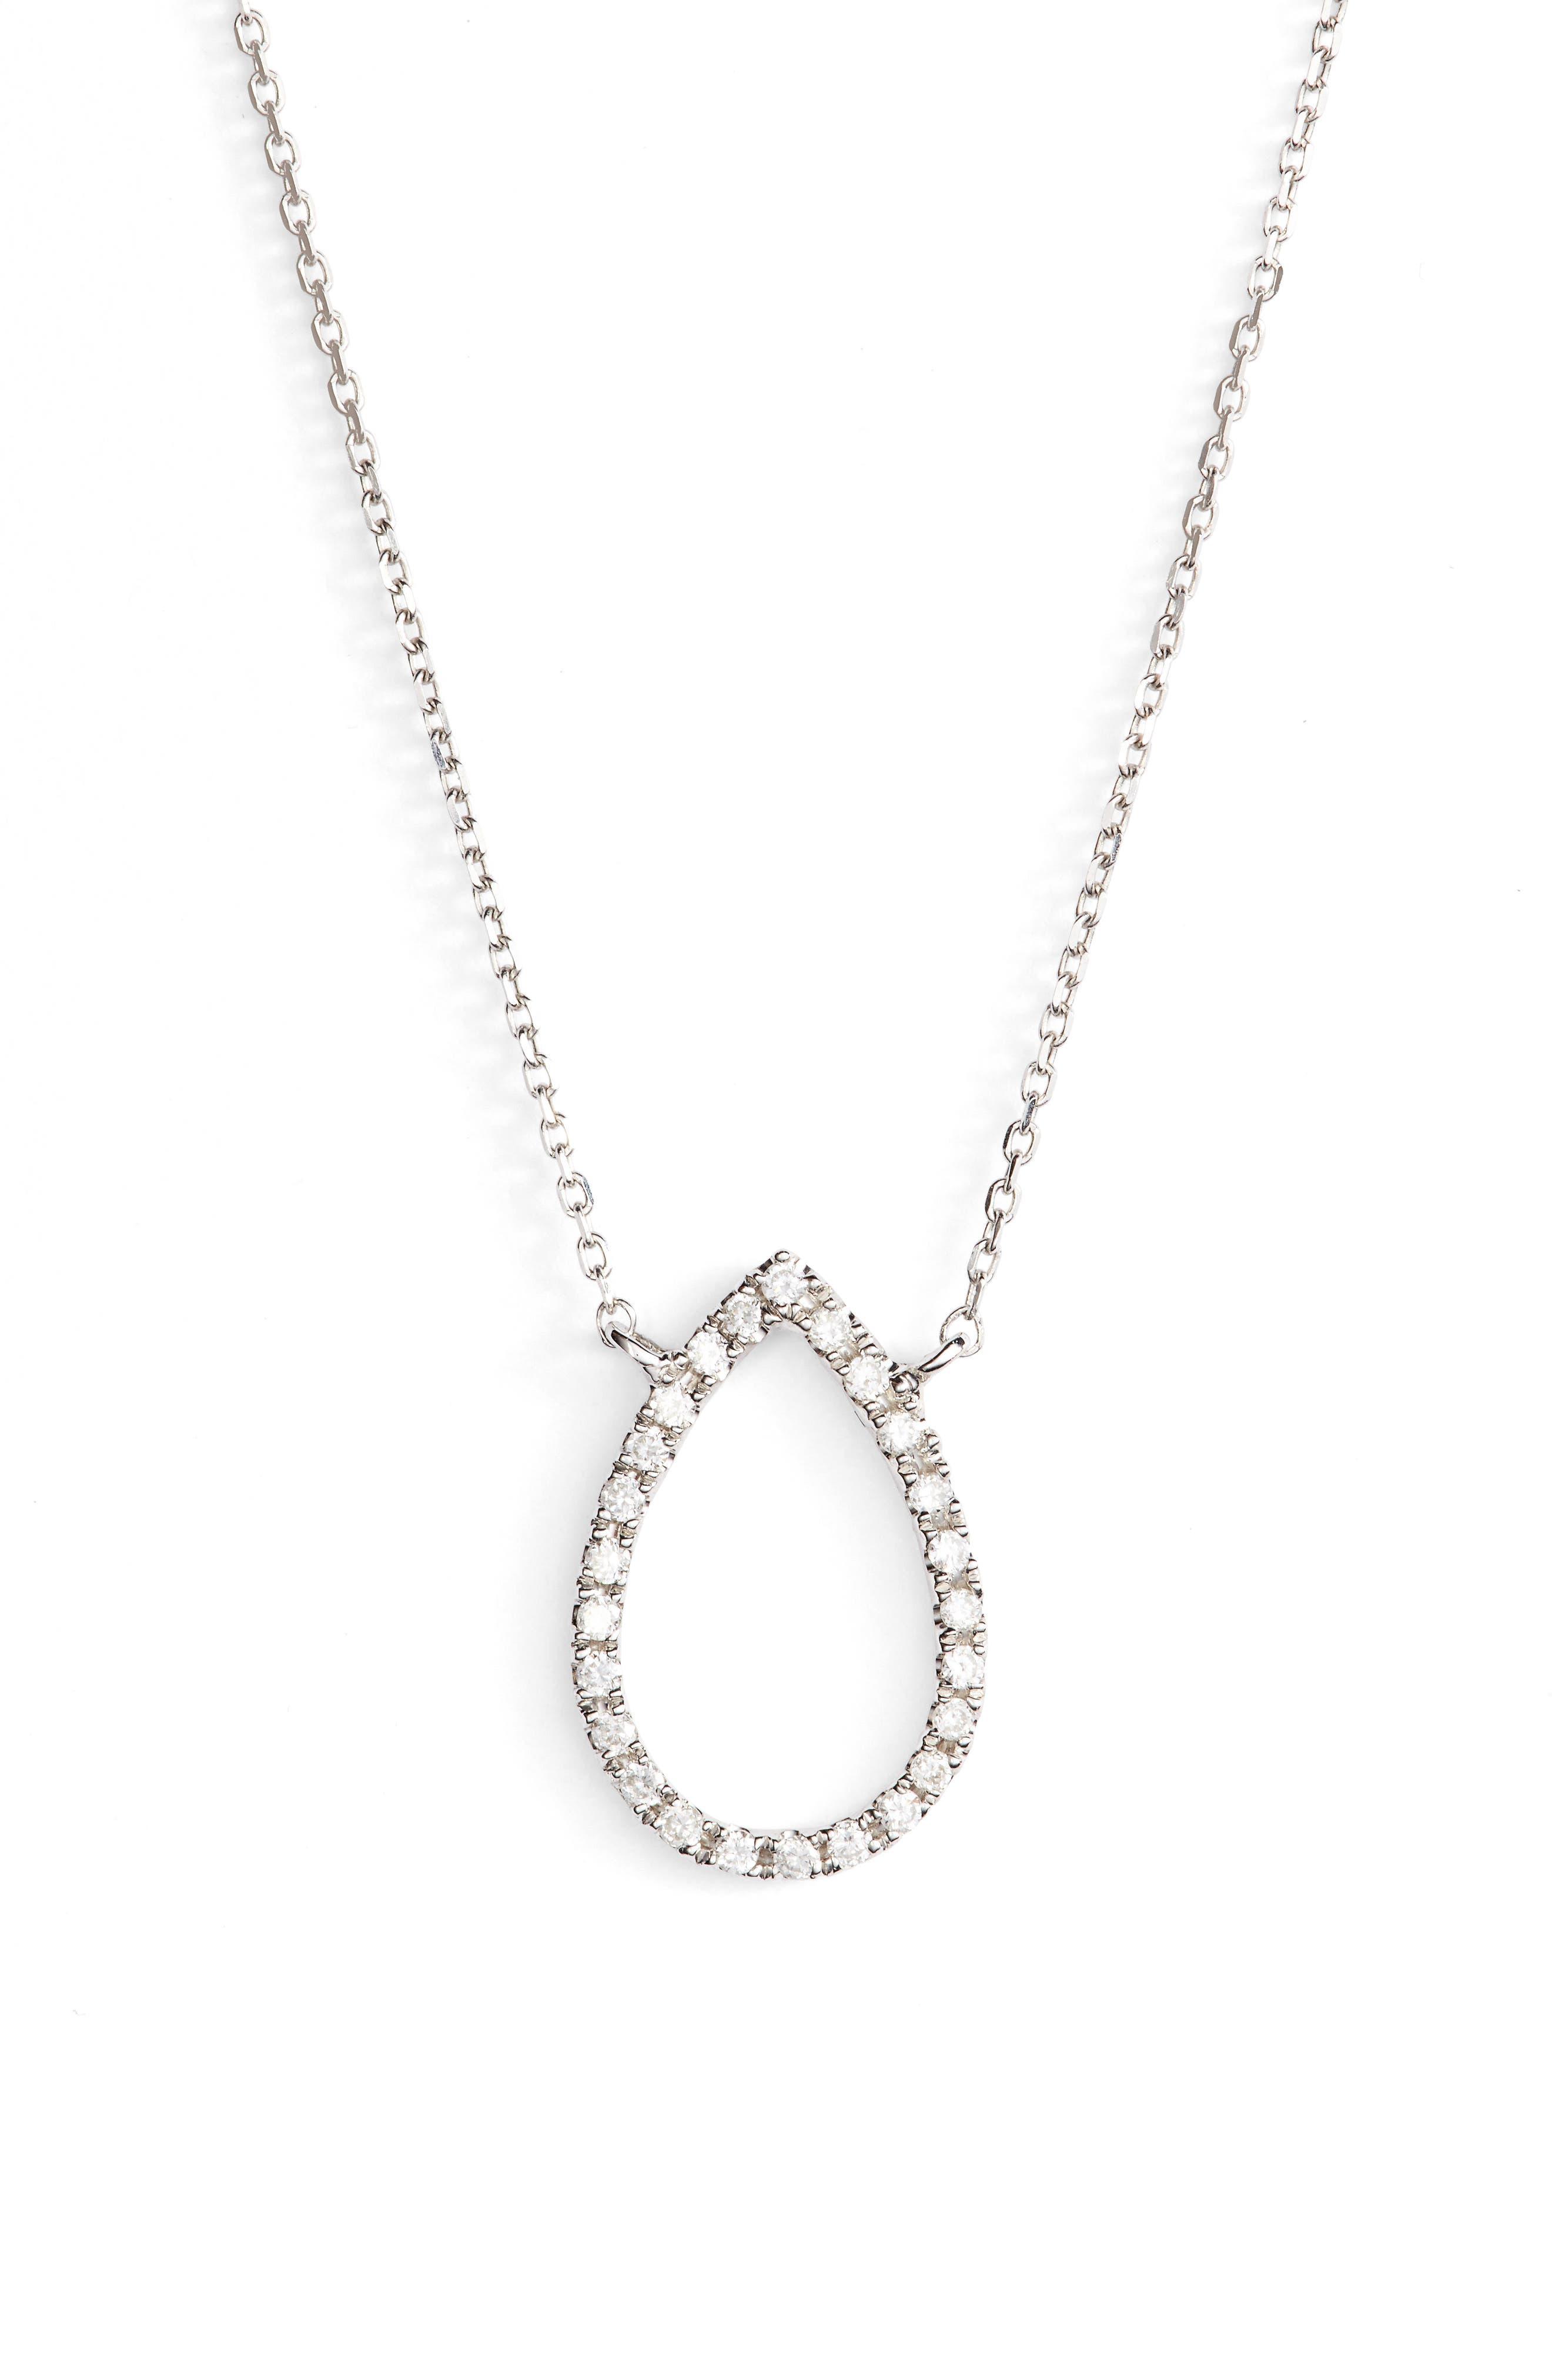 DANA REBECCA DESIGNS, Marquise Diamond Pendant Necklace, Main thumbnail 1, color, WHITE GOLD